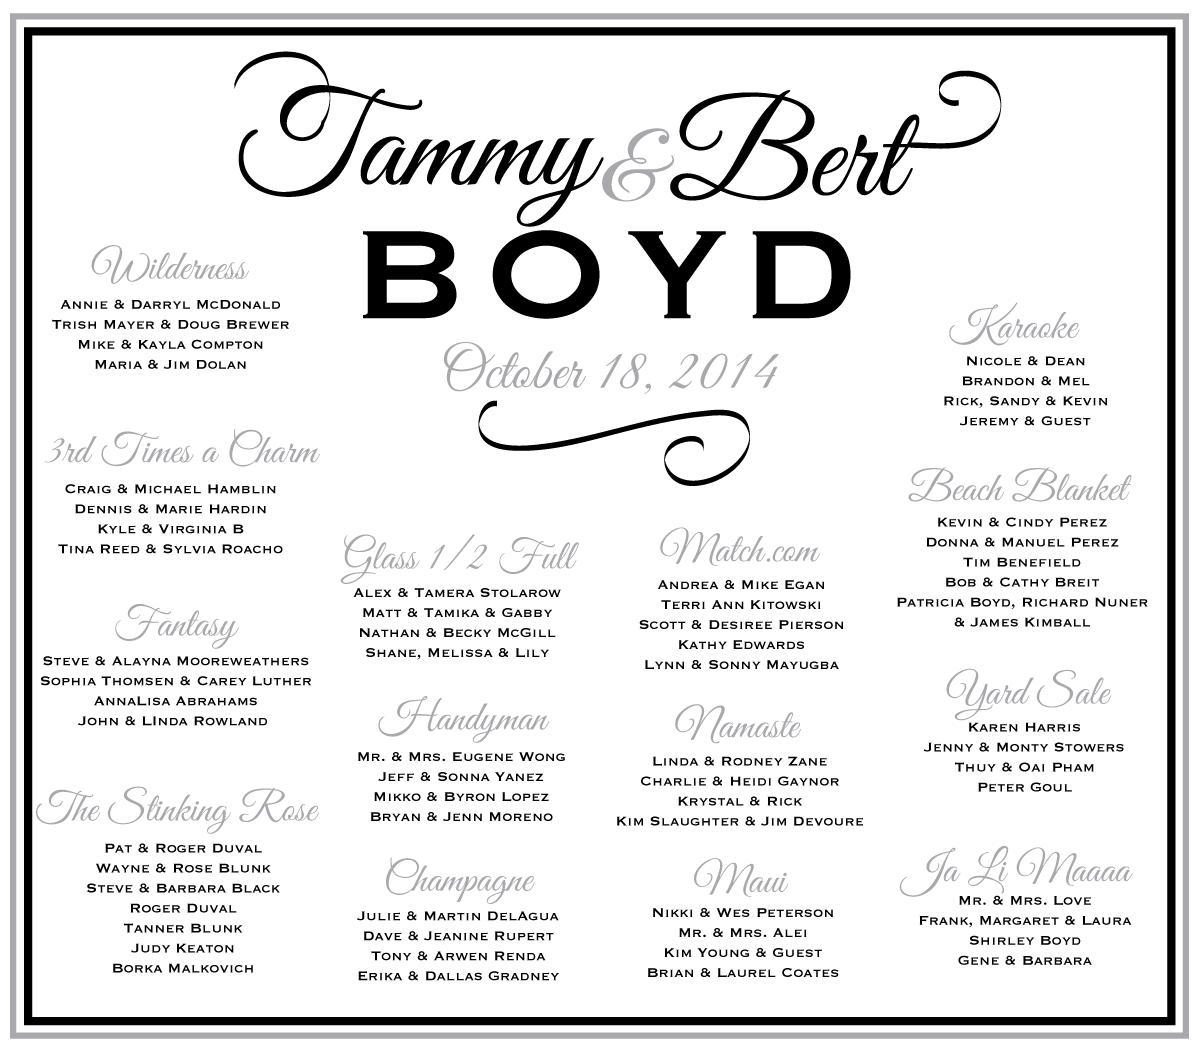 Last Name Wedding Themes: Wedding Seating Chart Using Couples New Last Name